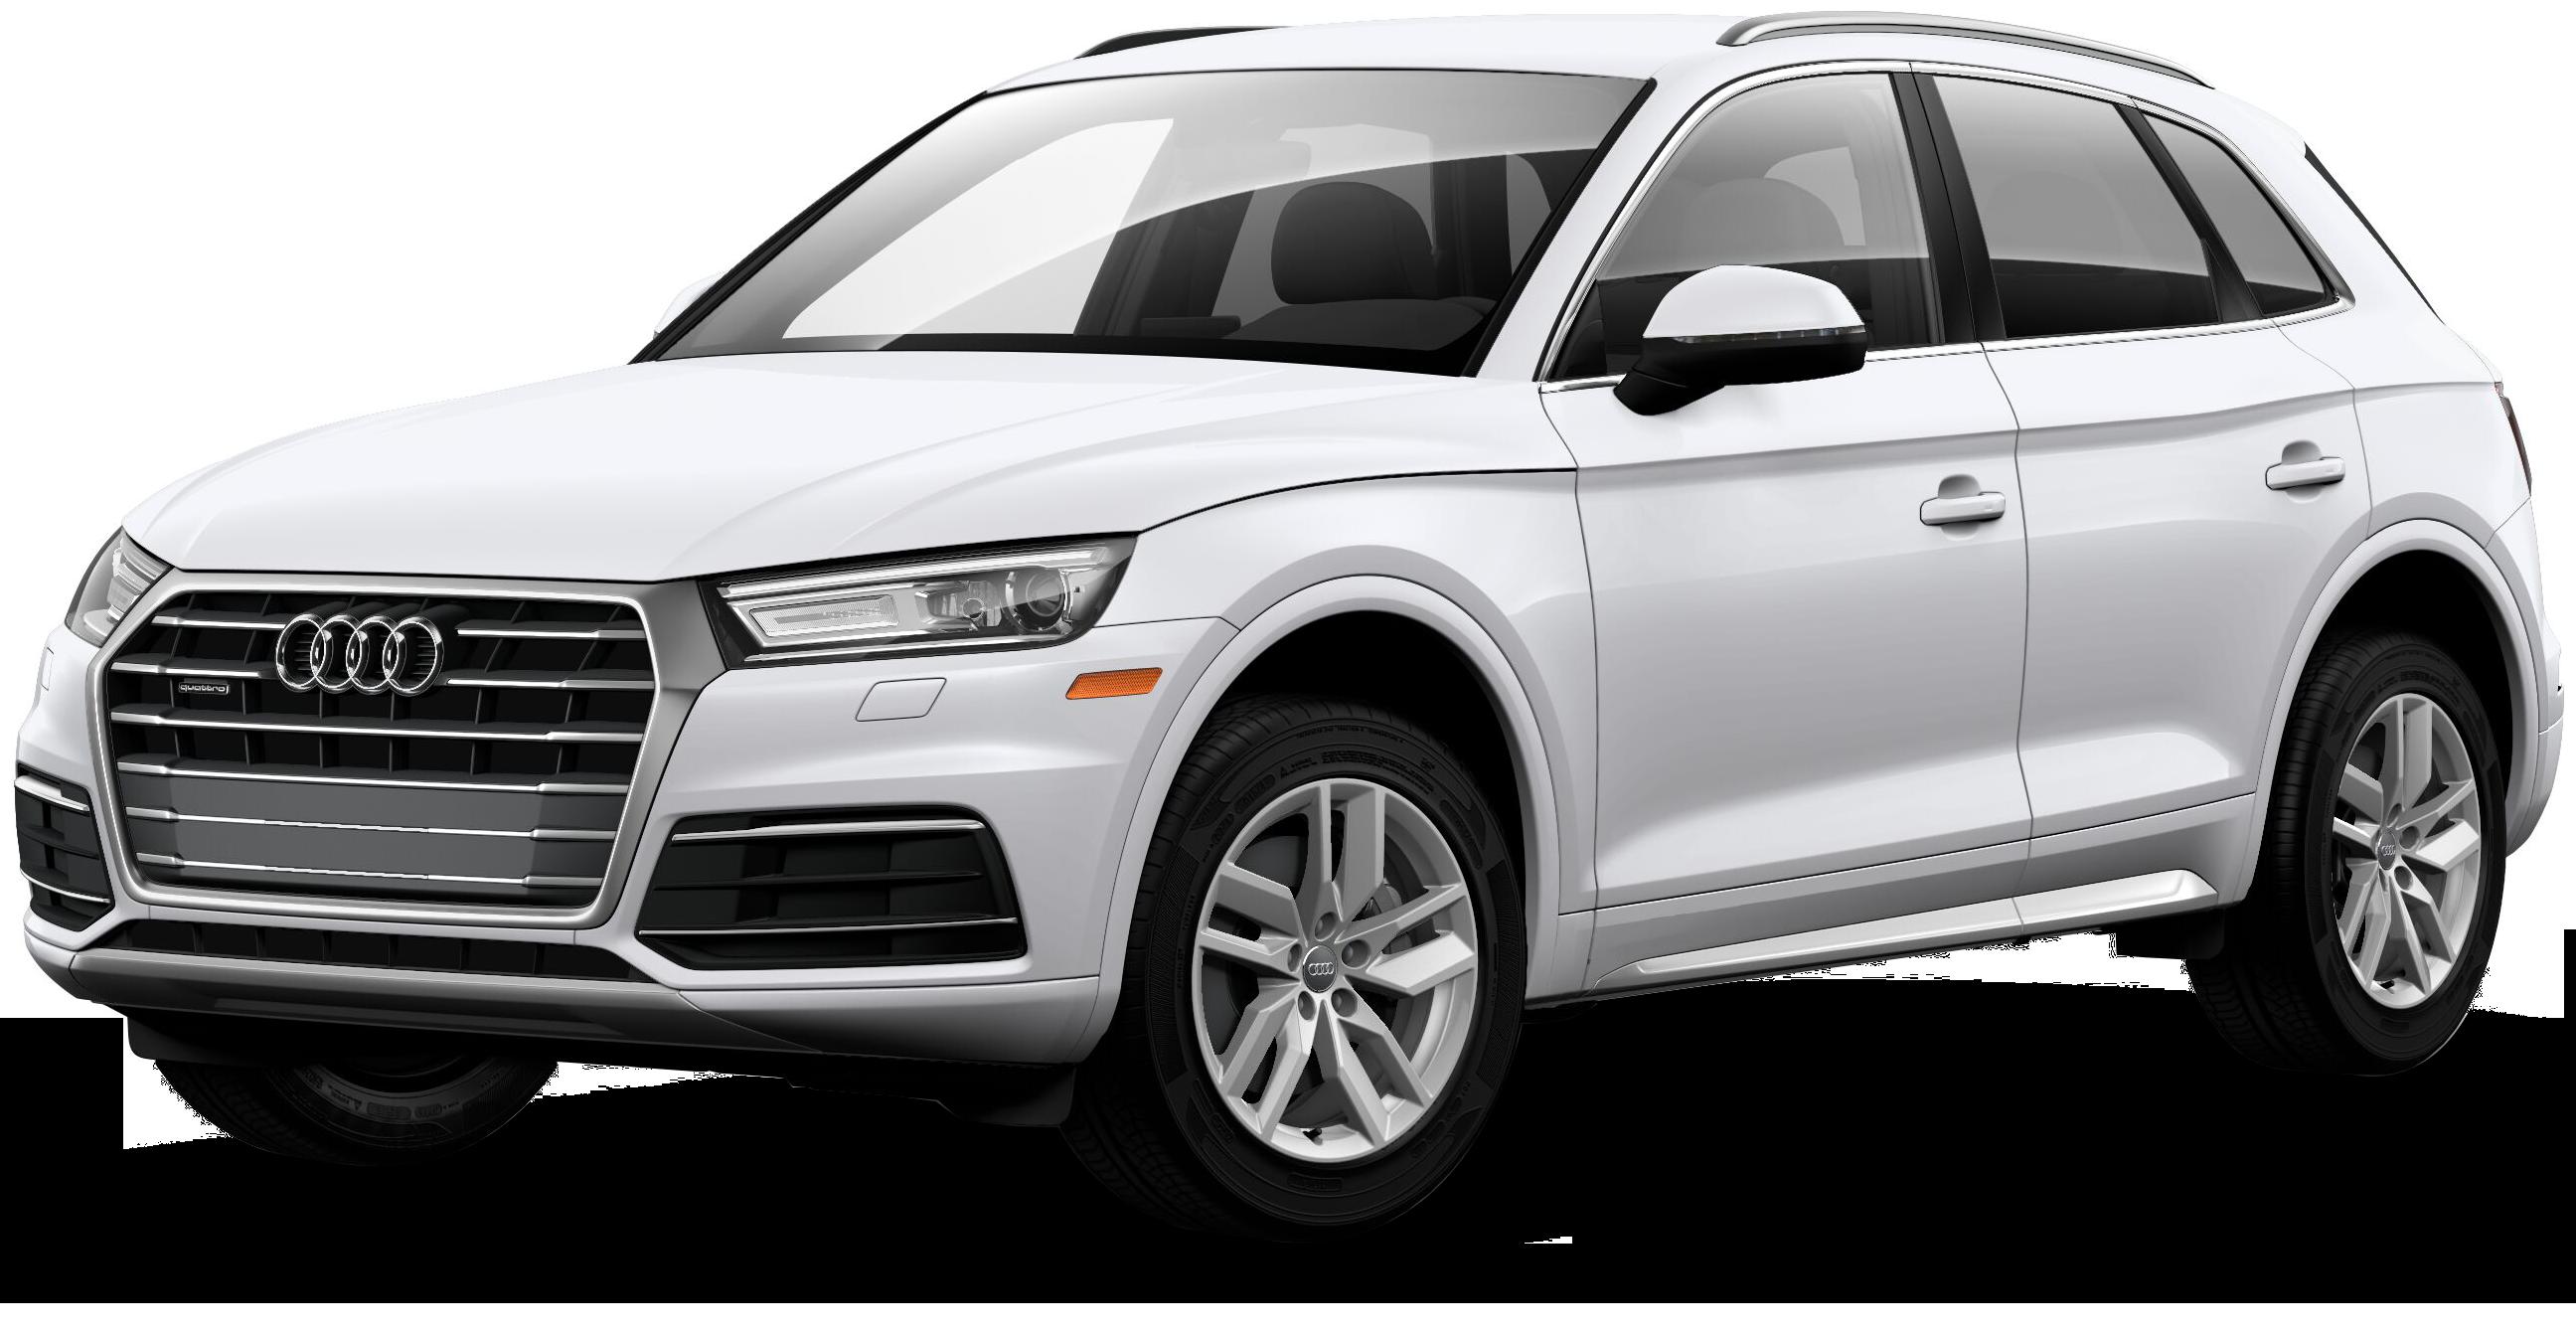 Range Rover Norwood >> 2020 Range Rover Evoque vs. Competitors Near Boston   Land ...